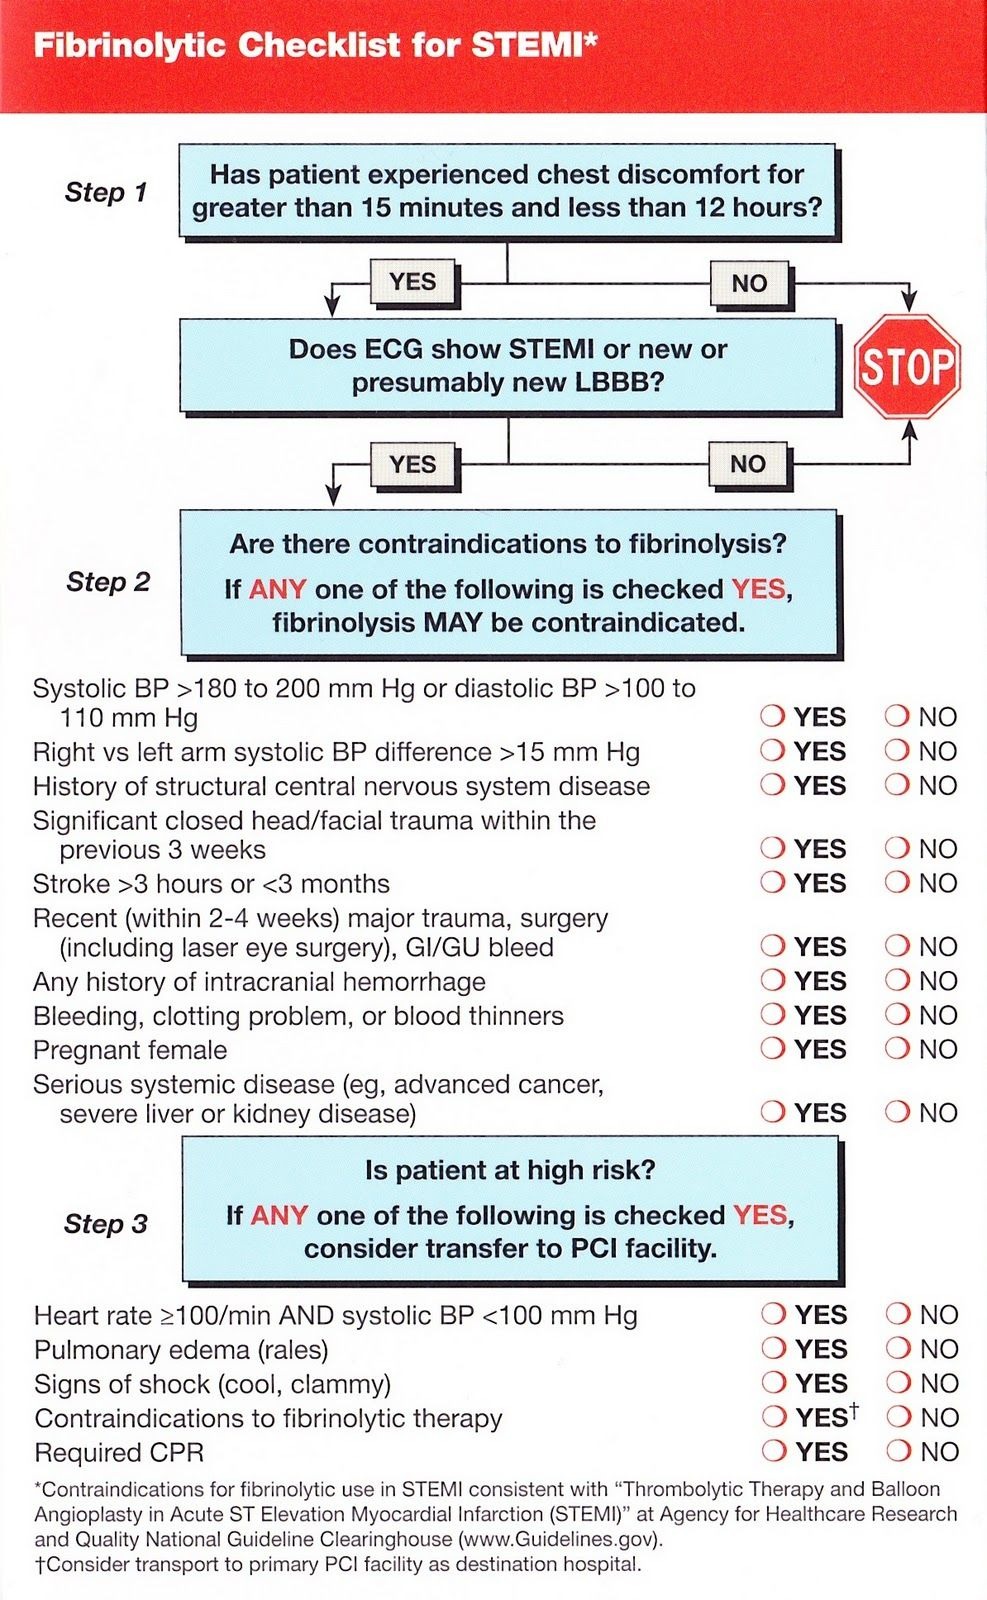 Fibrinolytic checklist for stemi aclsbls pinterest nurse education nvjuhfo Gallery